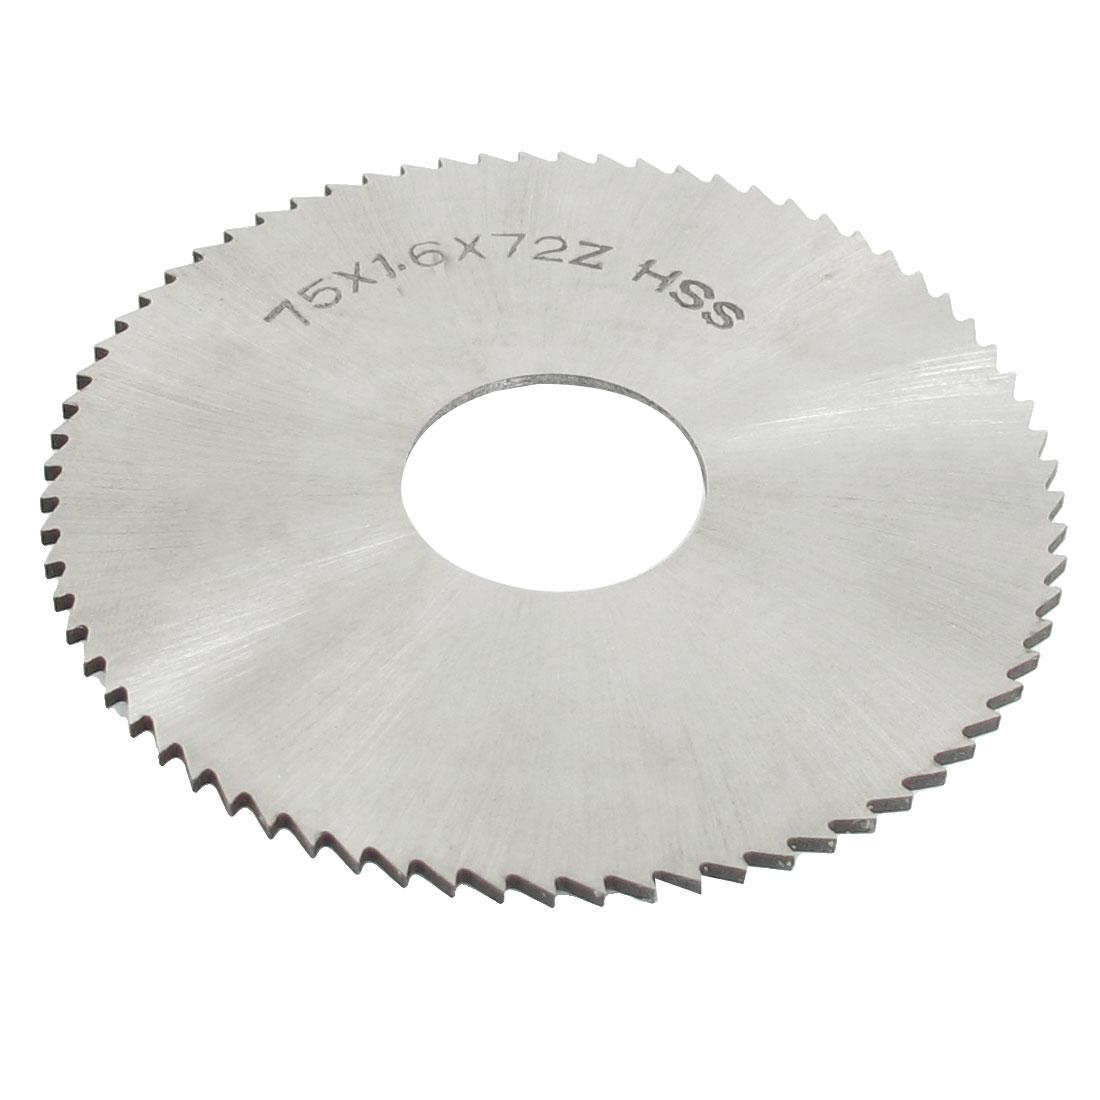 "2 15/16"" x 7/8"" x 1/16"" Circular Rotated HSS Slitting Saw 72 Teeth 72T"